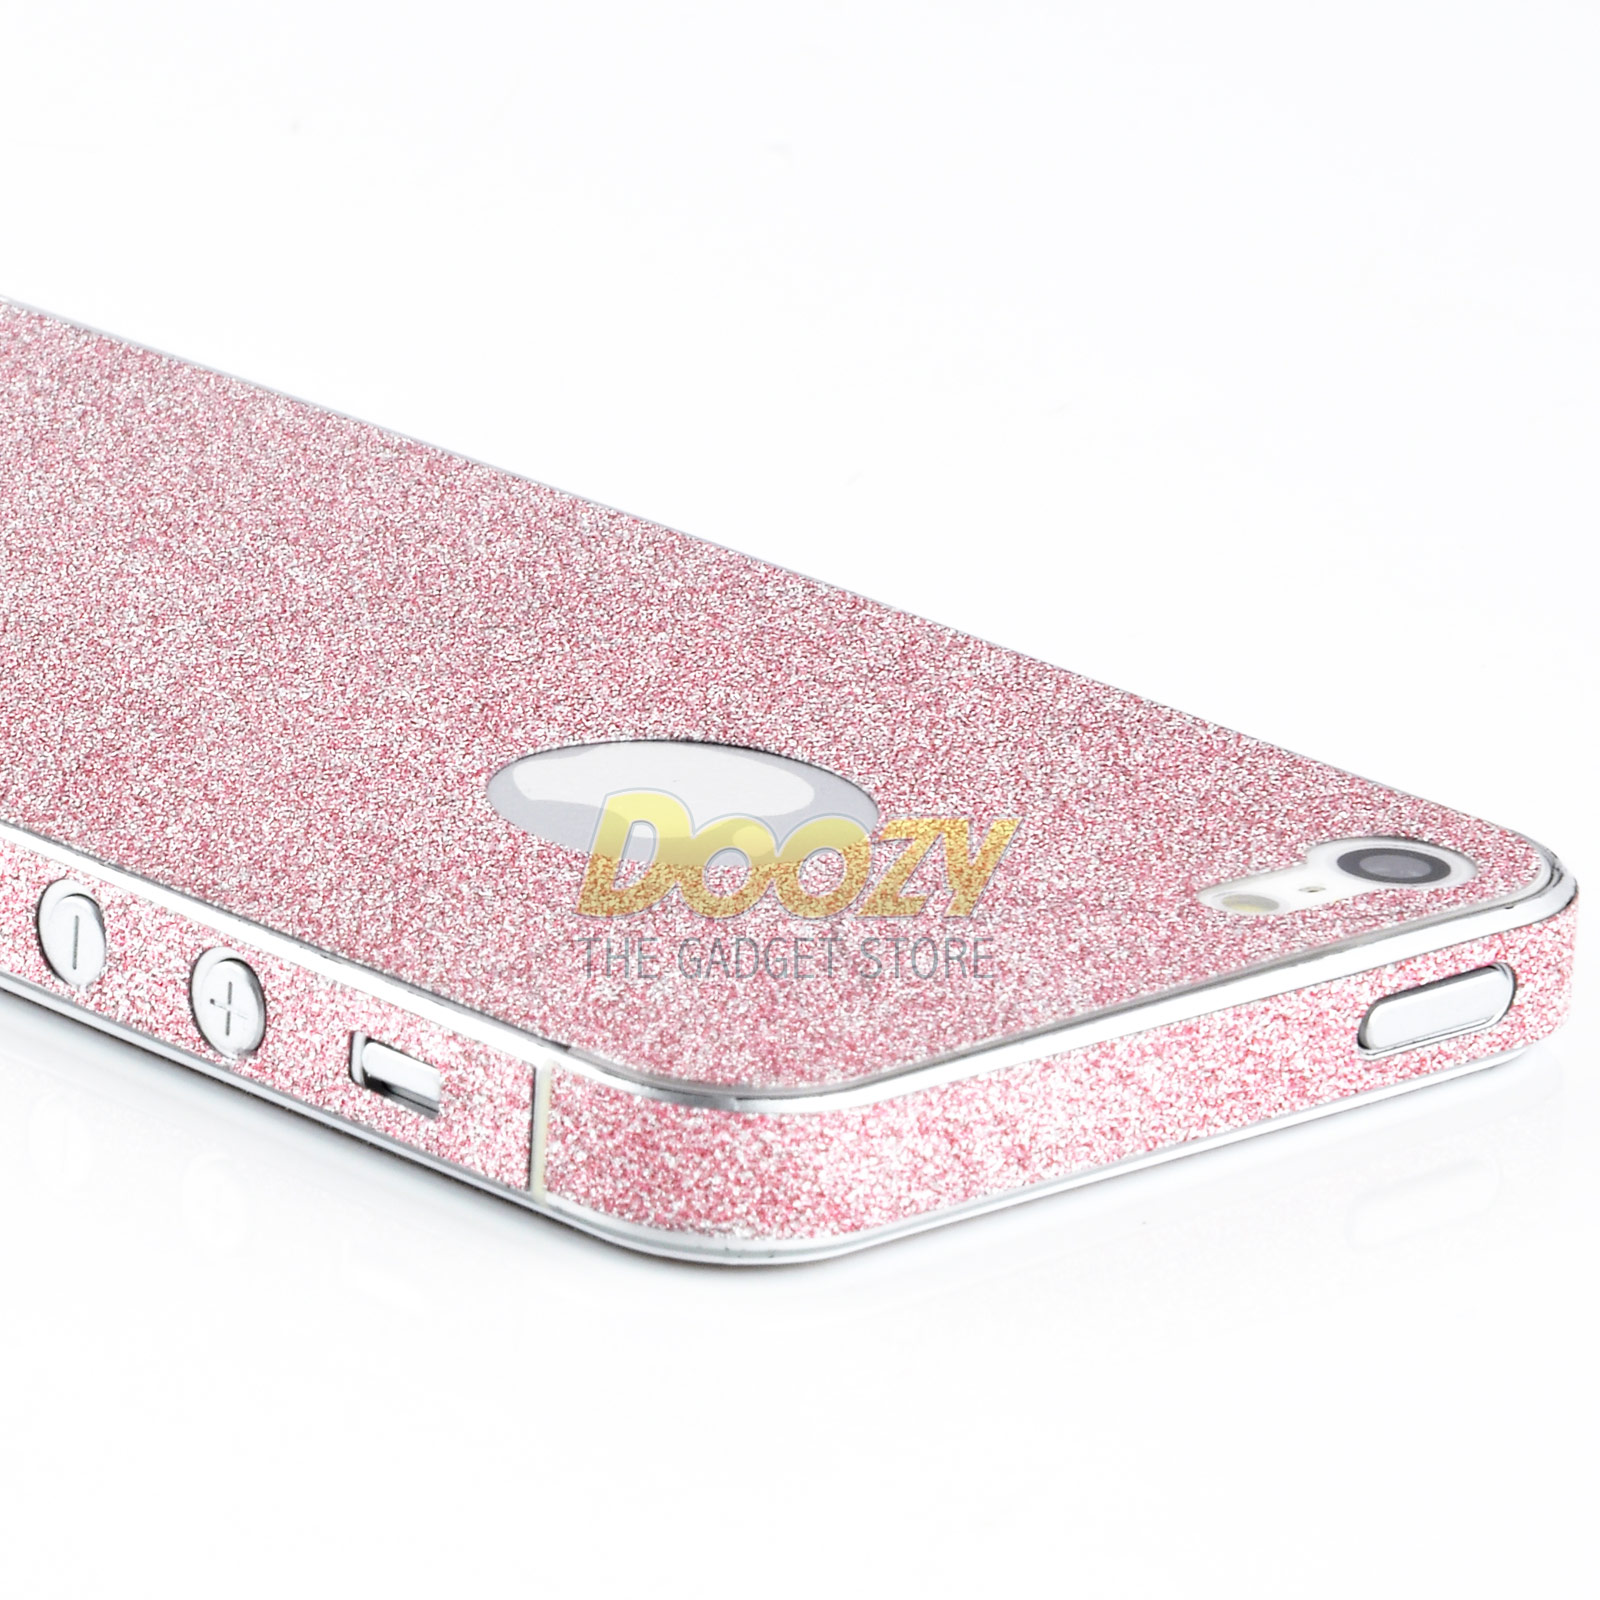 f r iphone 5 rosa glitzer design folie skin cover case girly pink bling. Black Bedroom Furniture Sets. Home Design Ideas